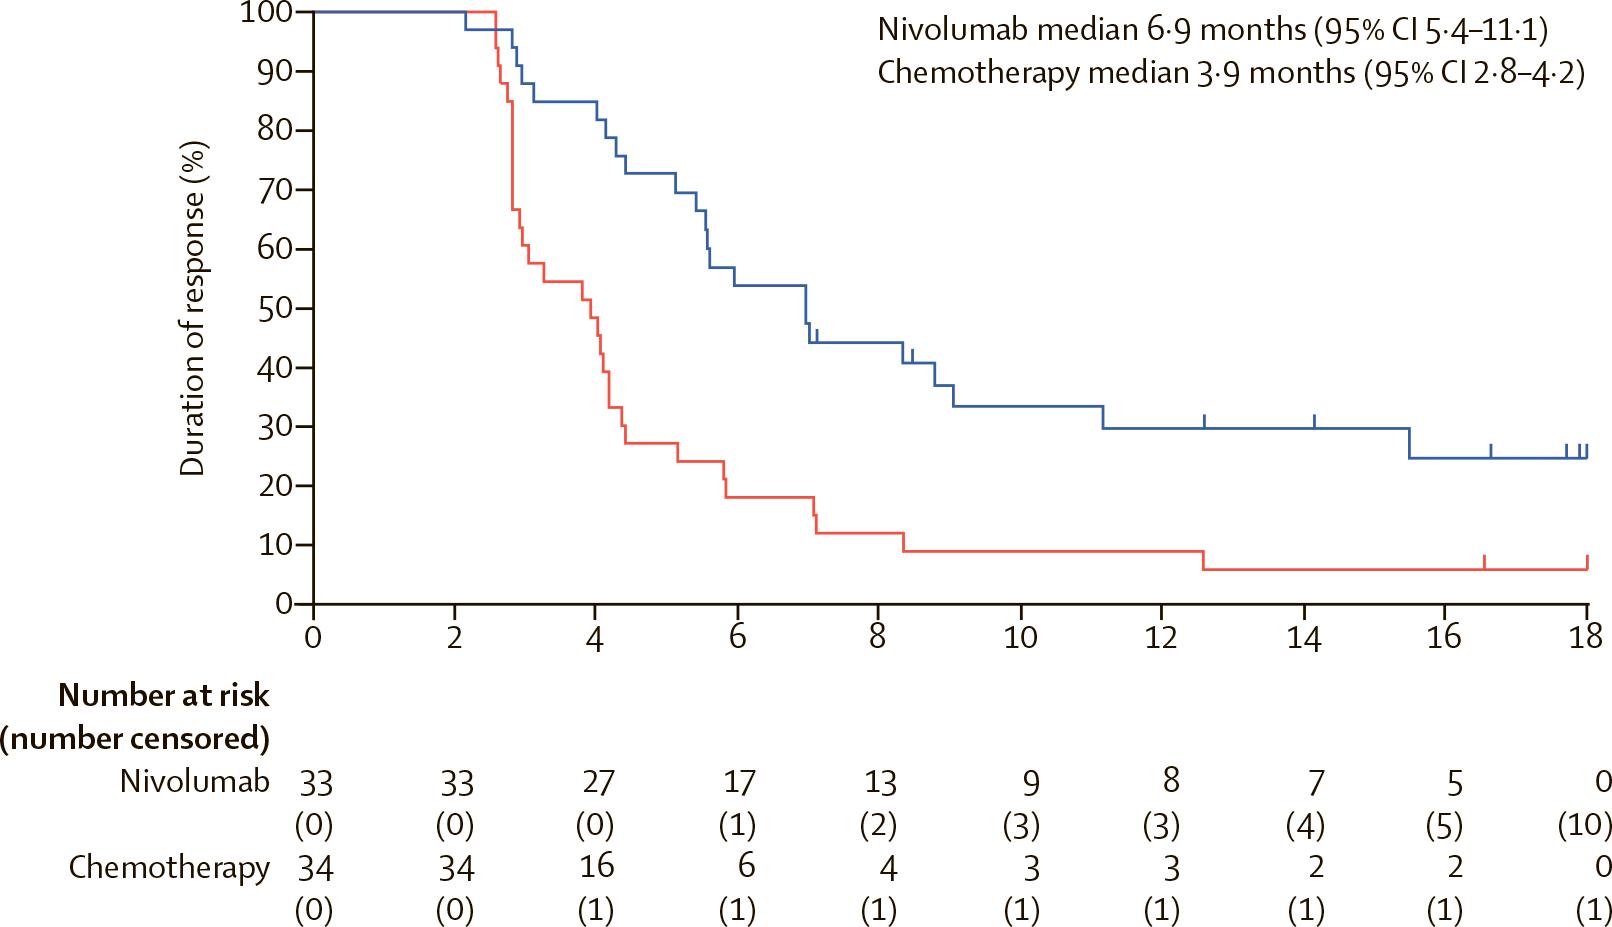 nct02569242 results 05 - Рак пищевода: назначайте «Опдиво» вместо химиотерапии